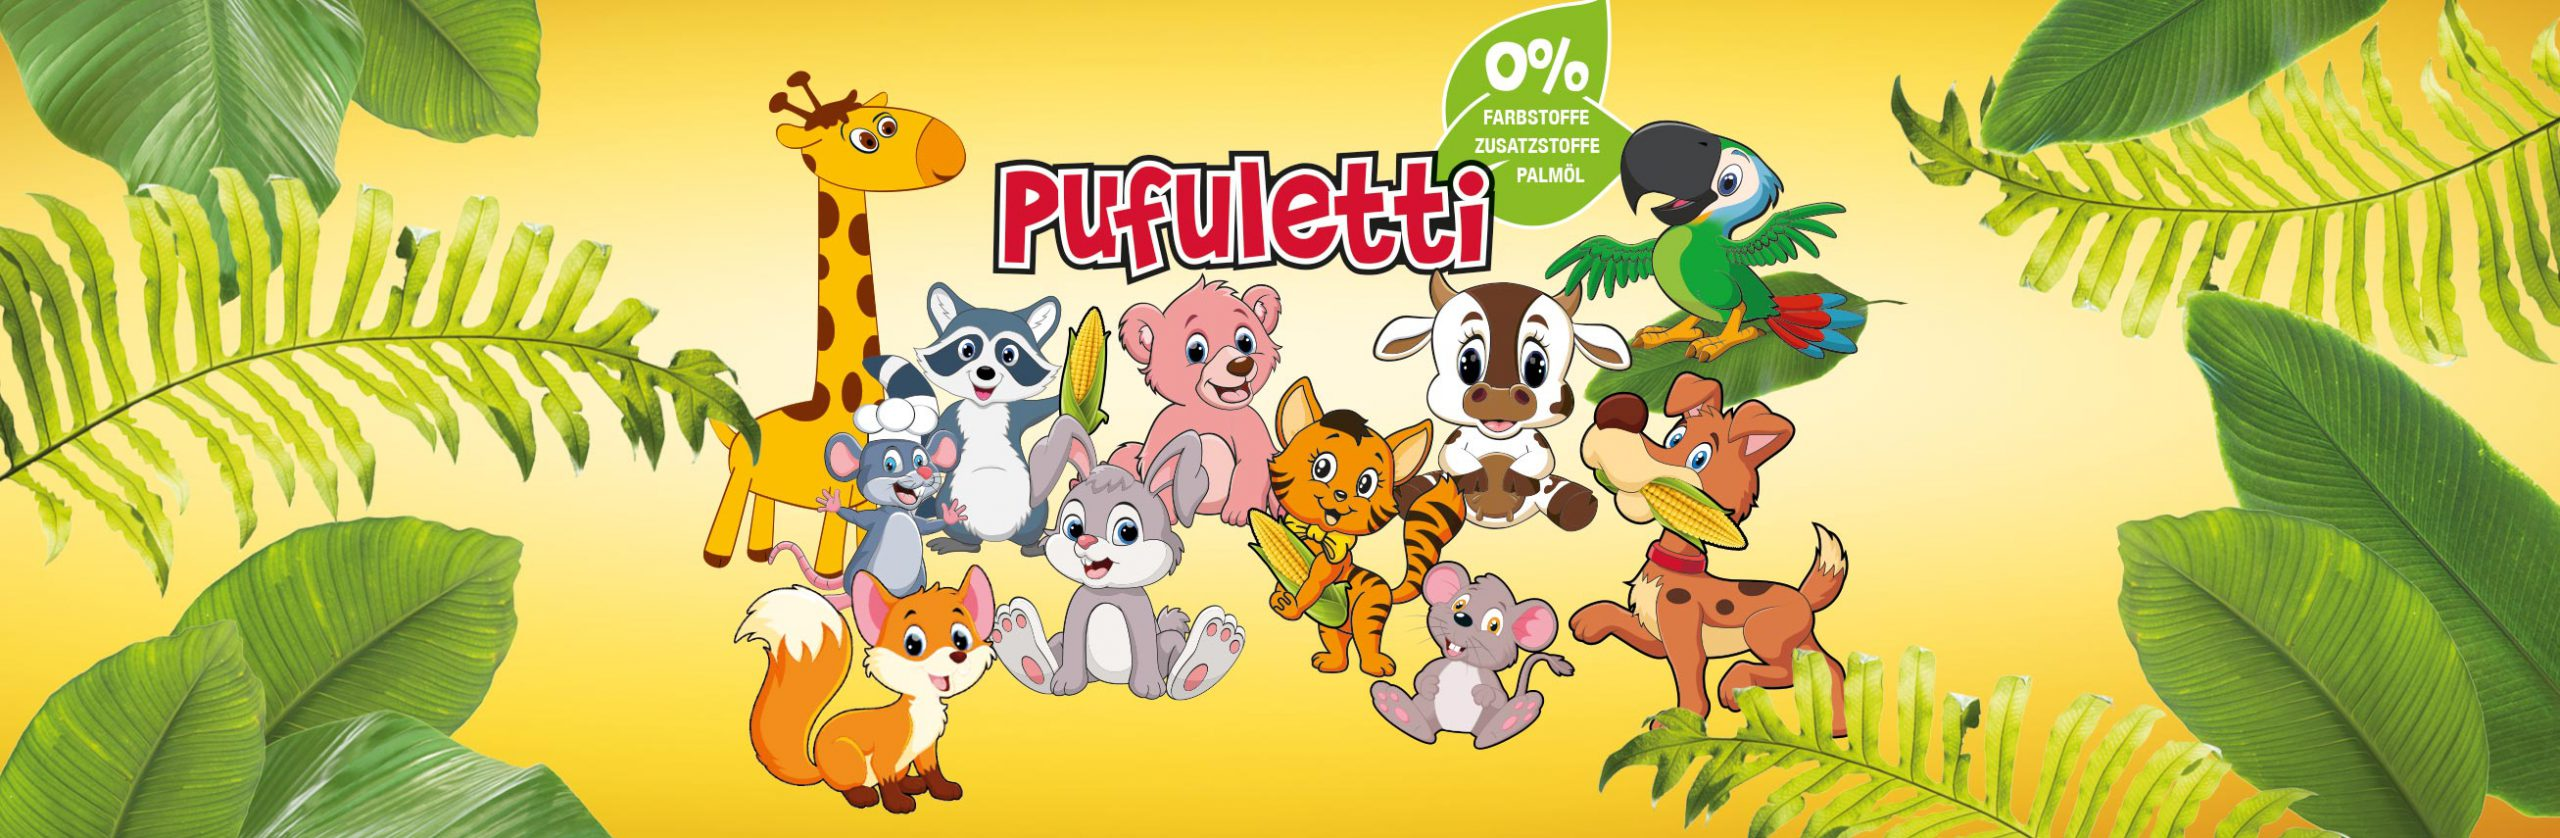 Pufuletti Banner